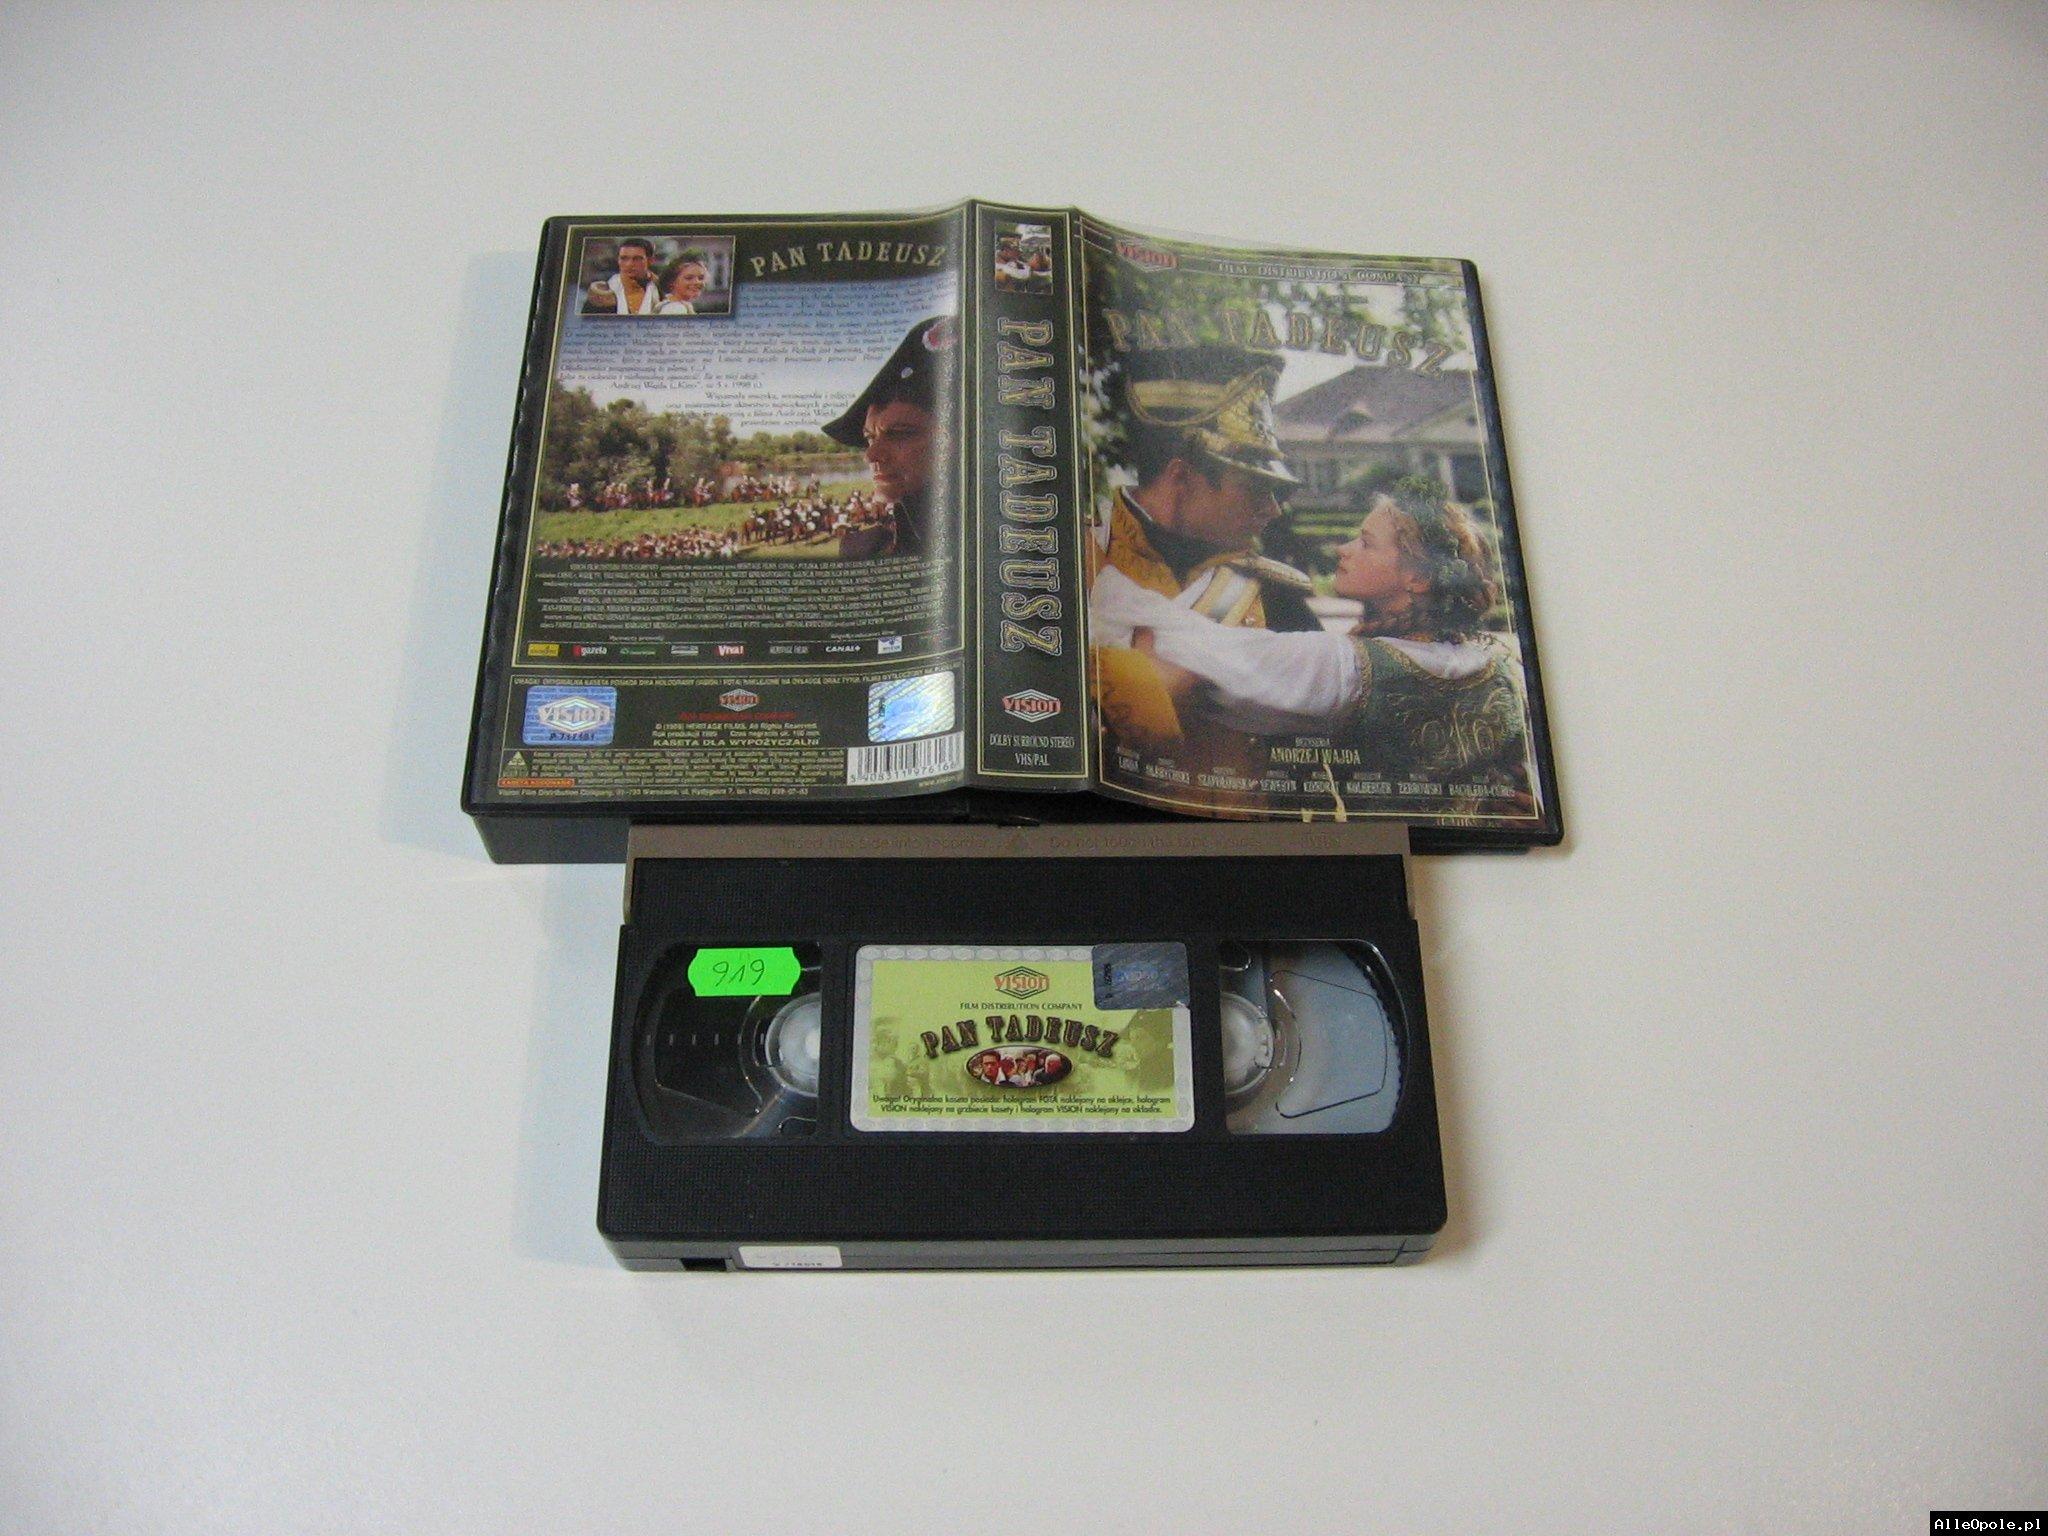 PAN TADEUSZ - VHS Kaseta Video - Opole 1775